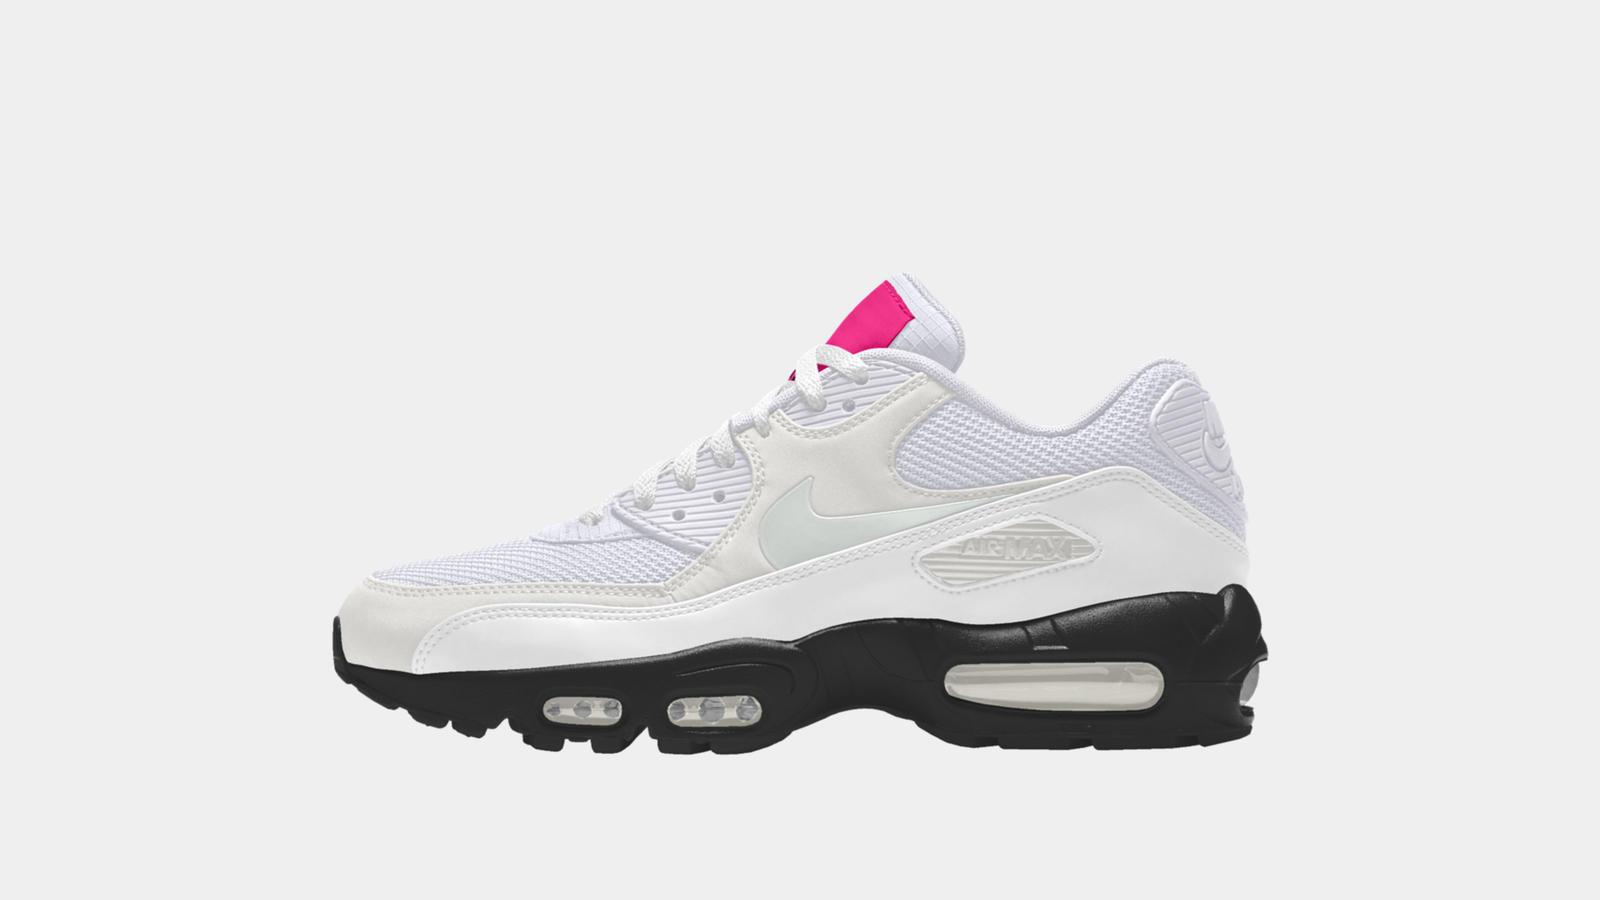 Customize Patta AM 90 x 95 and AM 95 x 90 Nike News